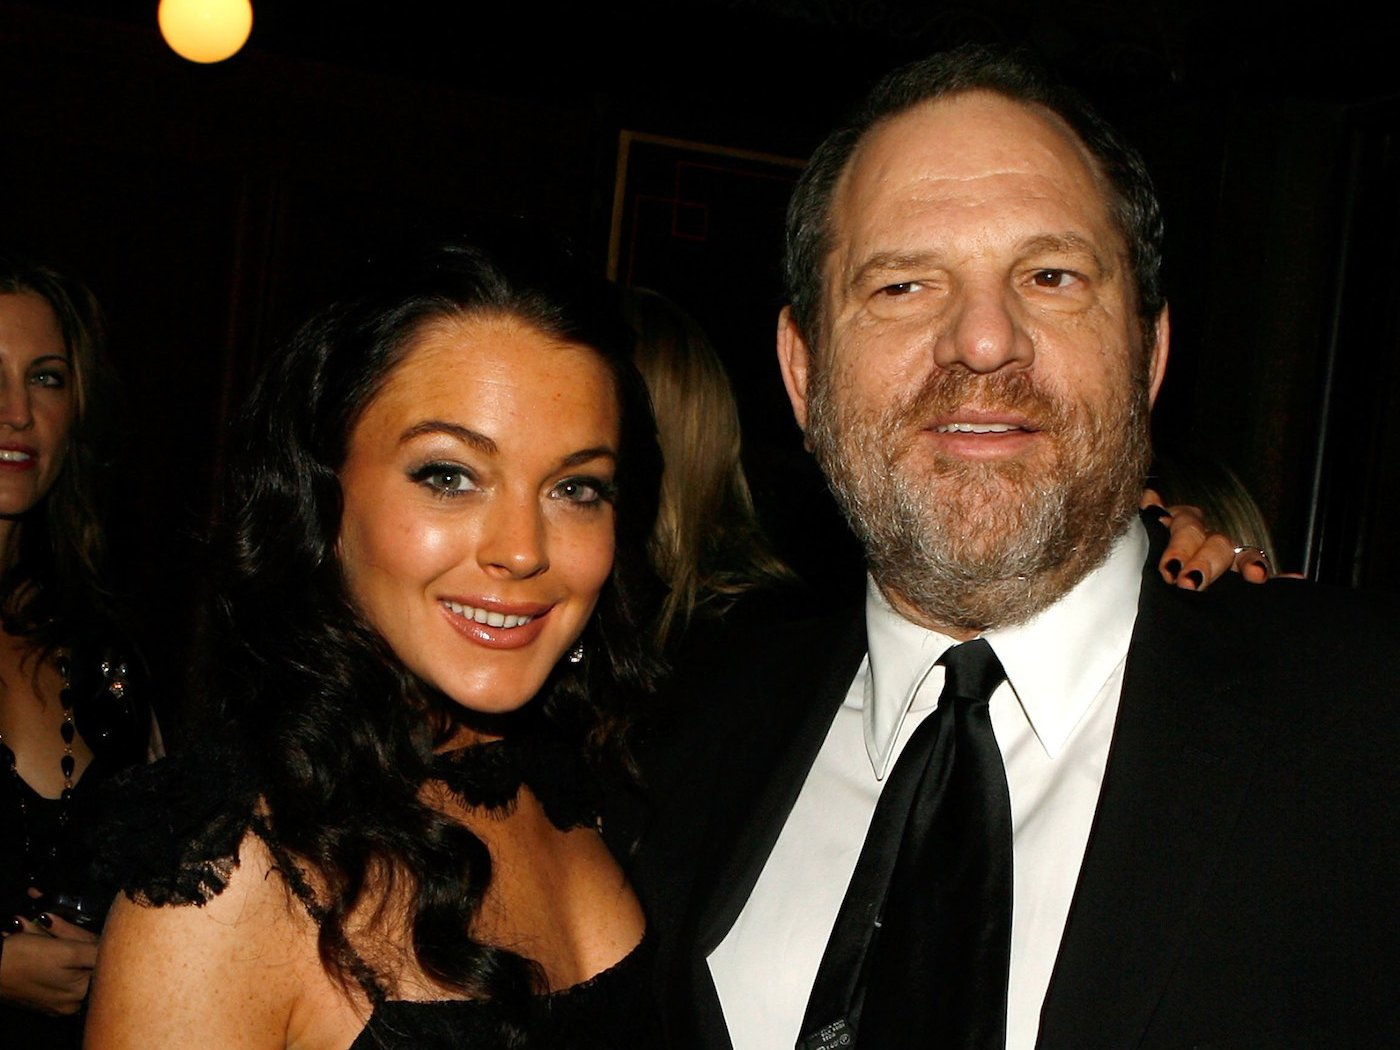 Asia, Angelina, Gwyneth e tutte le vip violentate o molestate da Weinstein